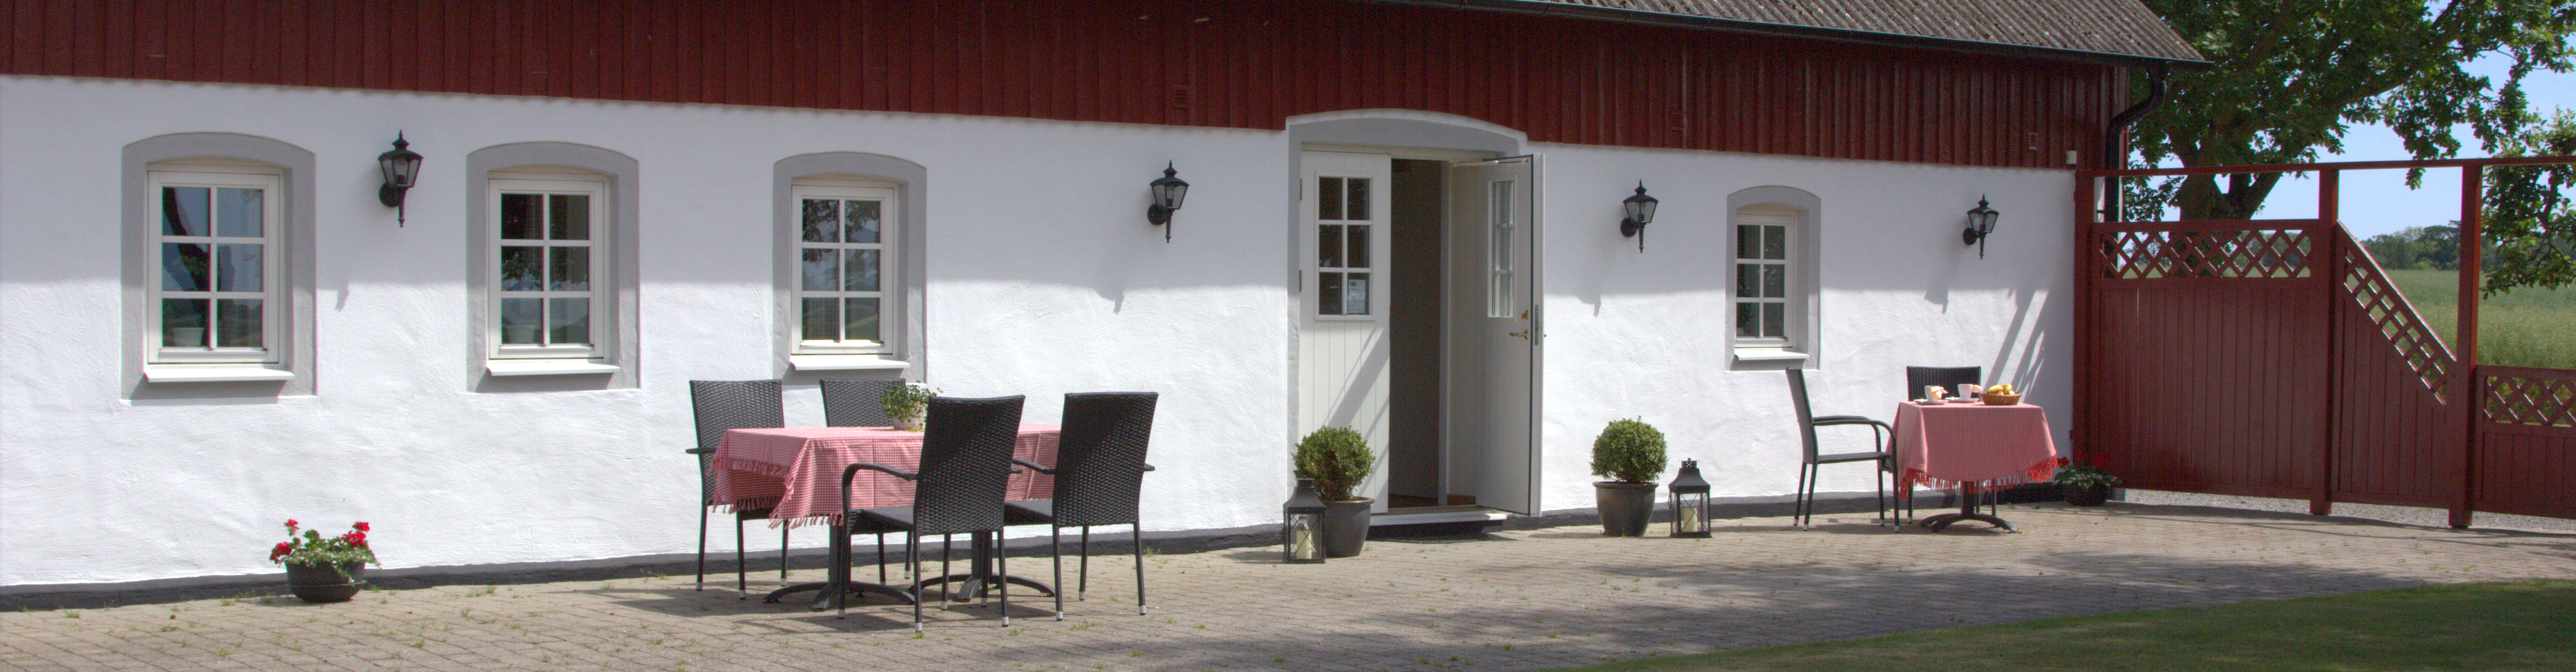 b&b near Ystad